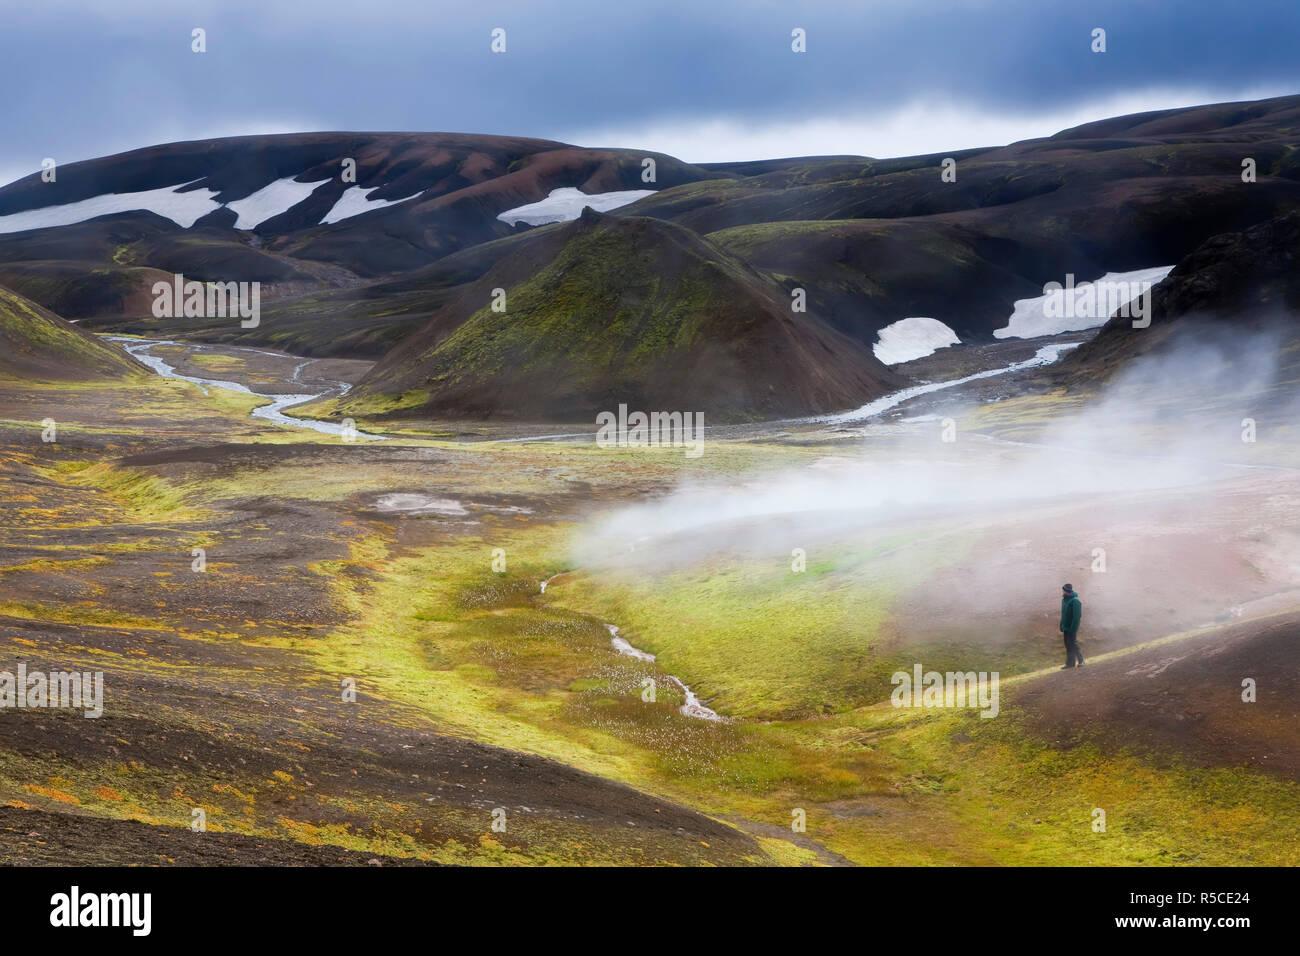 Steam vents, Rhiolite Mountains, Landmannalaugar, Iceland - Stock Image